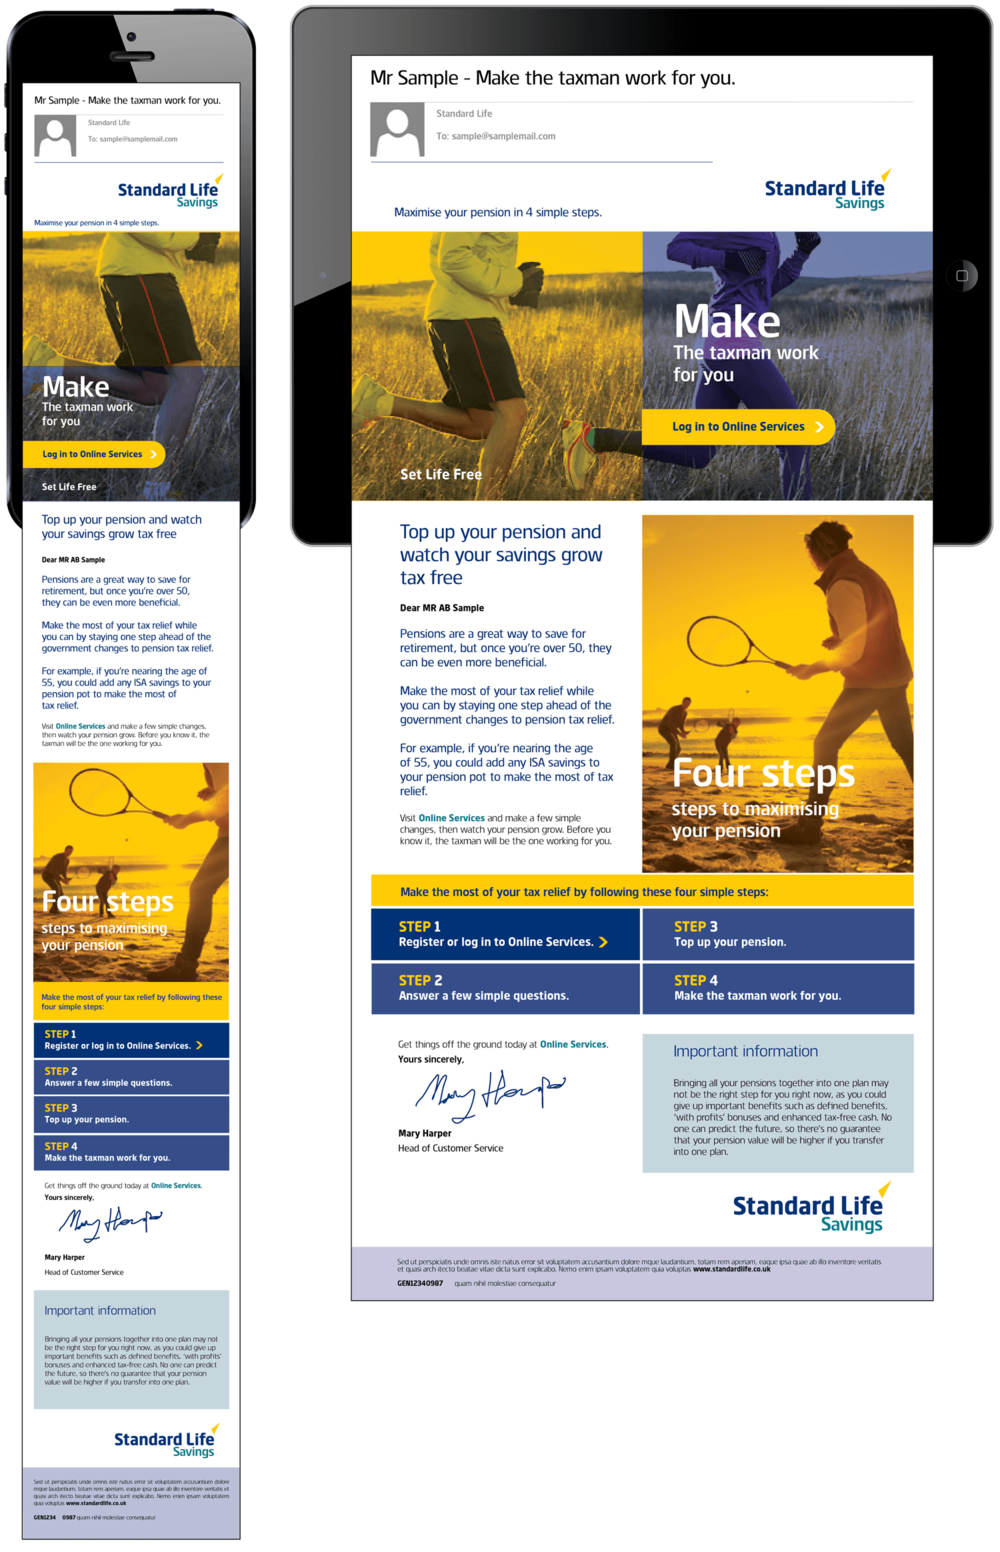 Standard life james bradley direct email marketing falaconquin